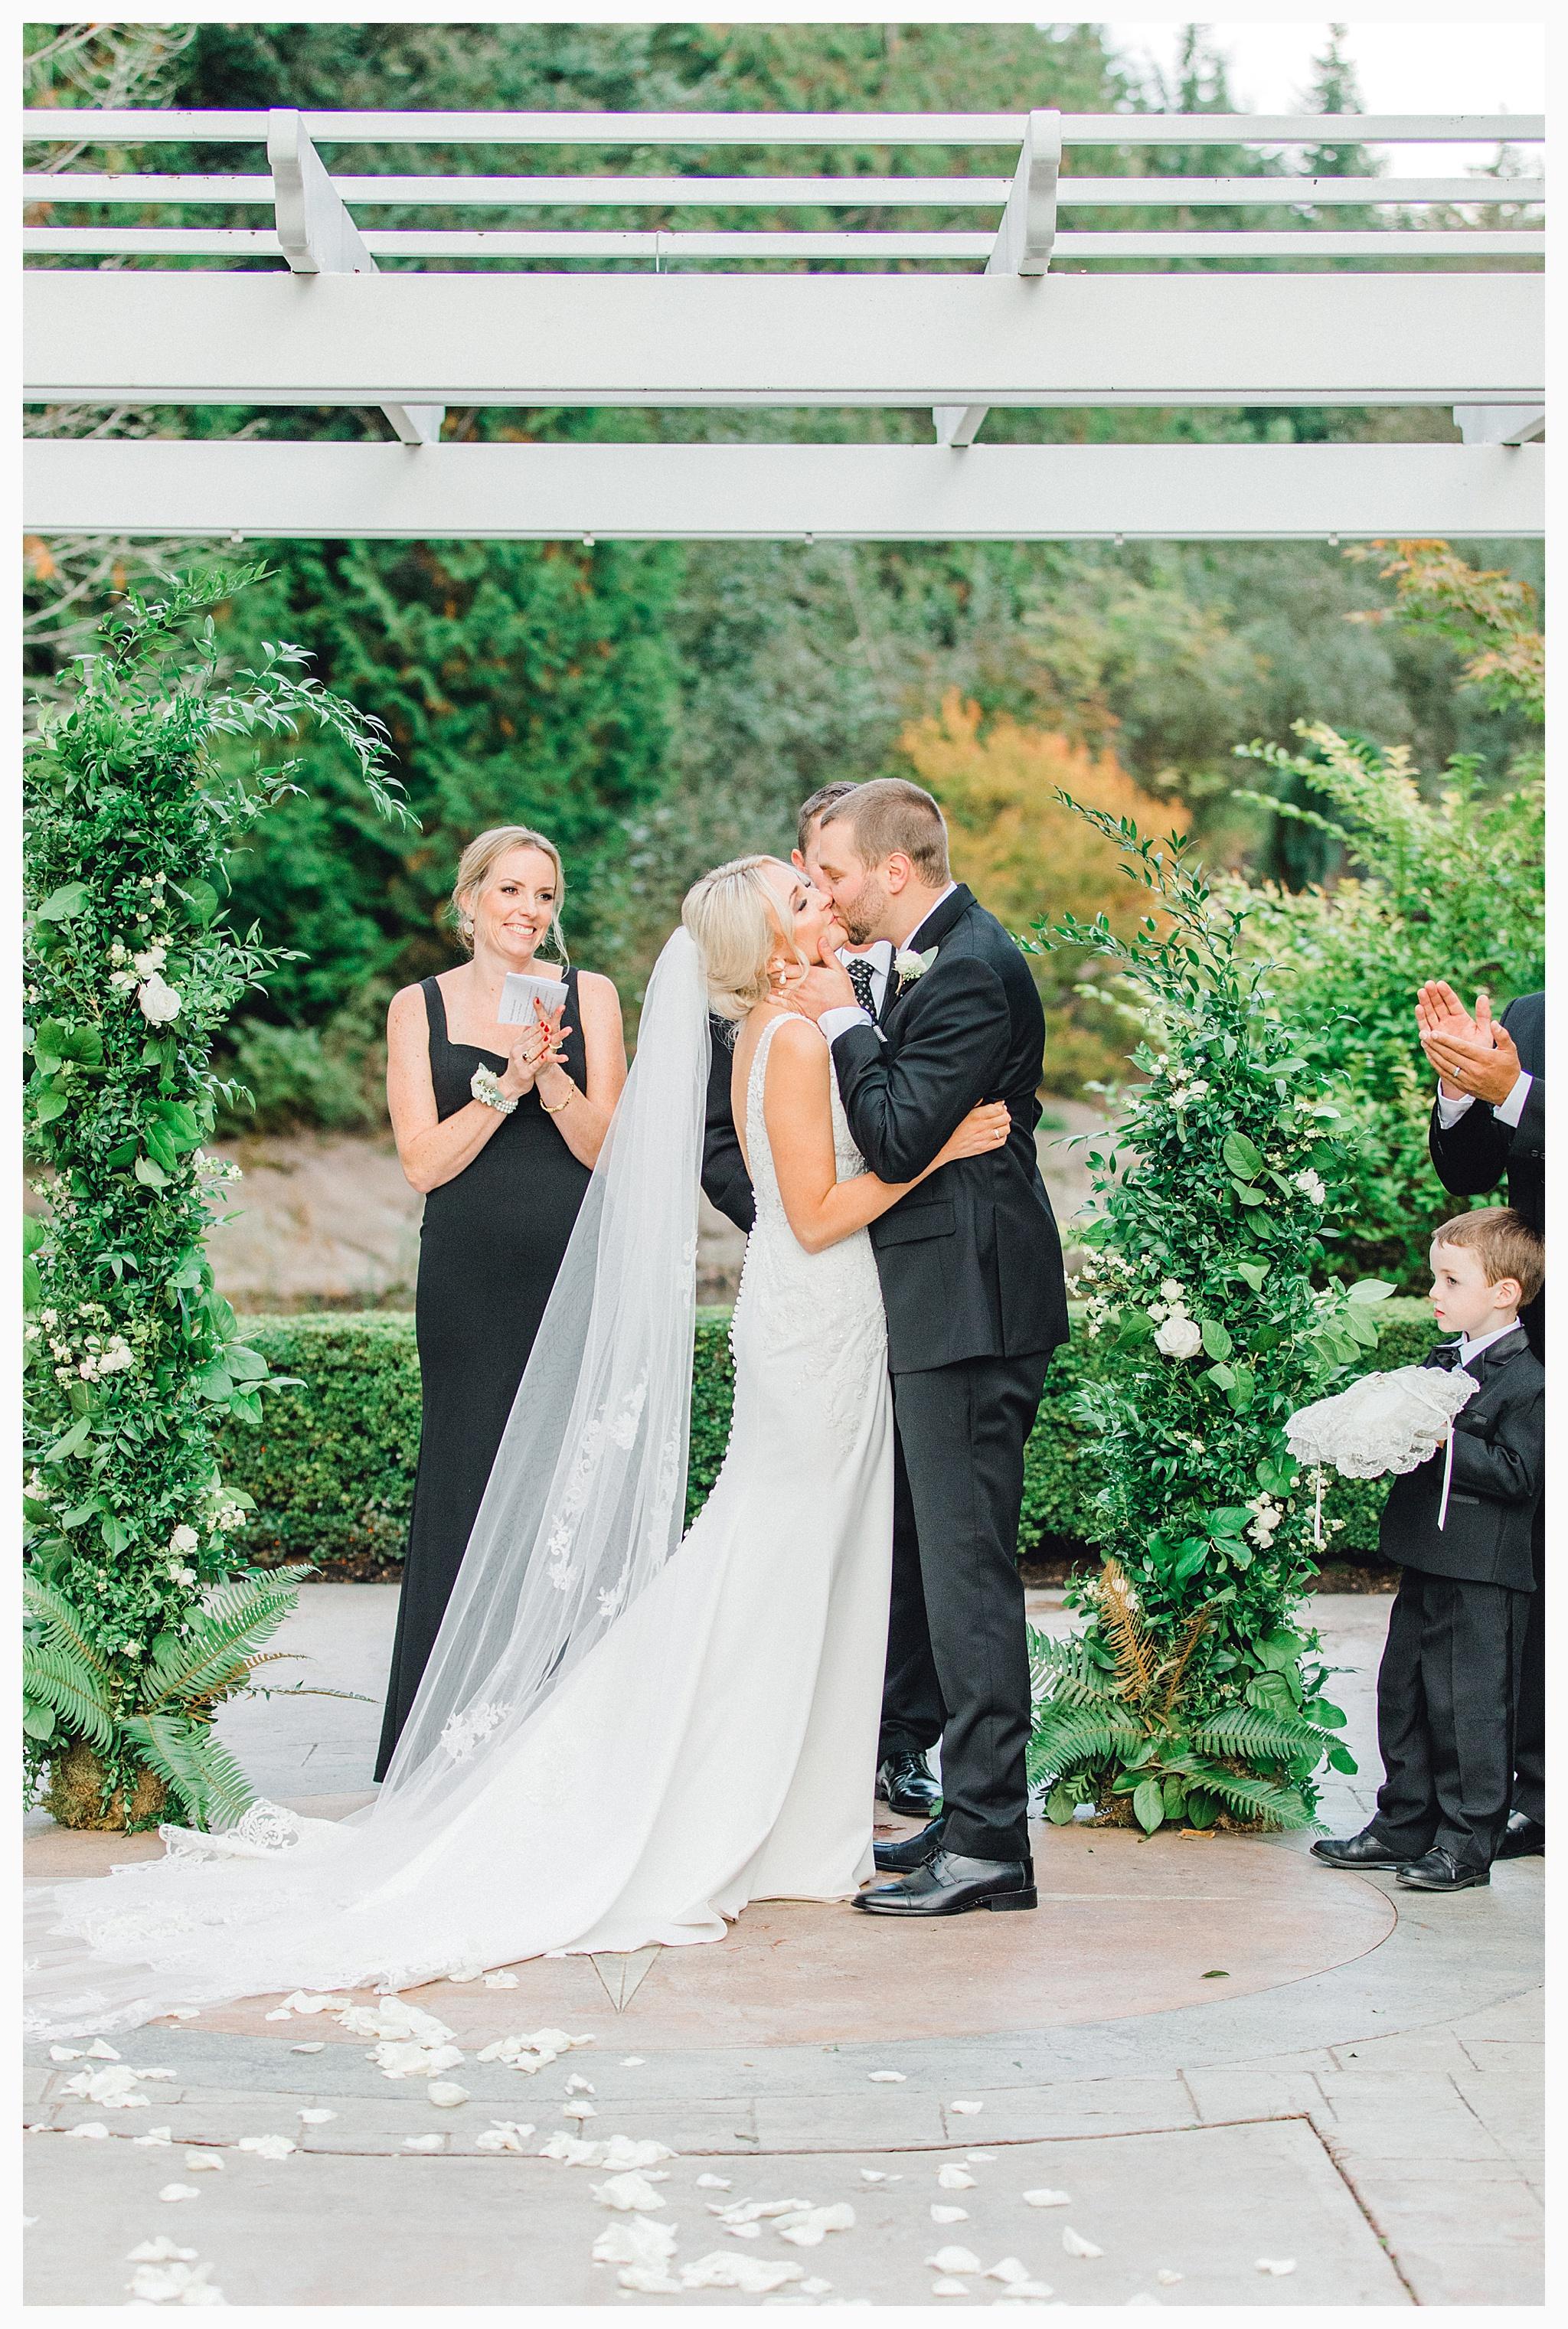 Emma Rose Company Light and Airy Wedding Photographer, Beautiful fall wedding at Rock Creek Gardens Venue in Puyallup, Washington._0079.jpg